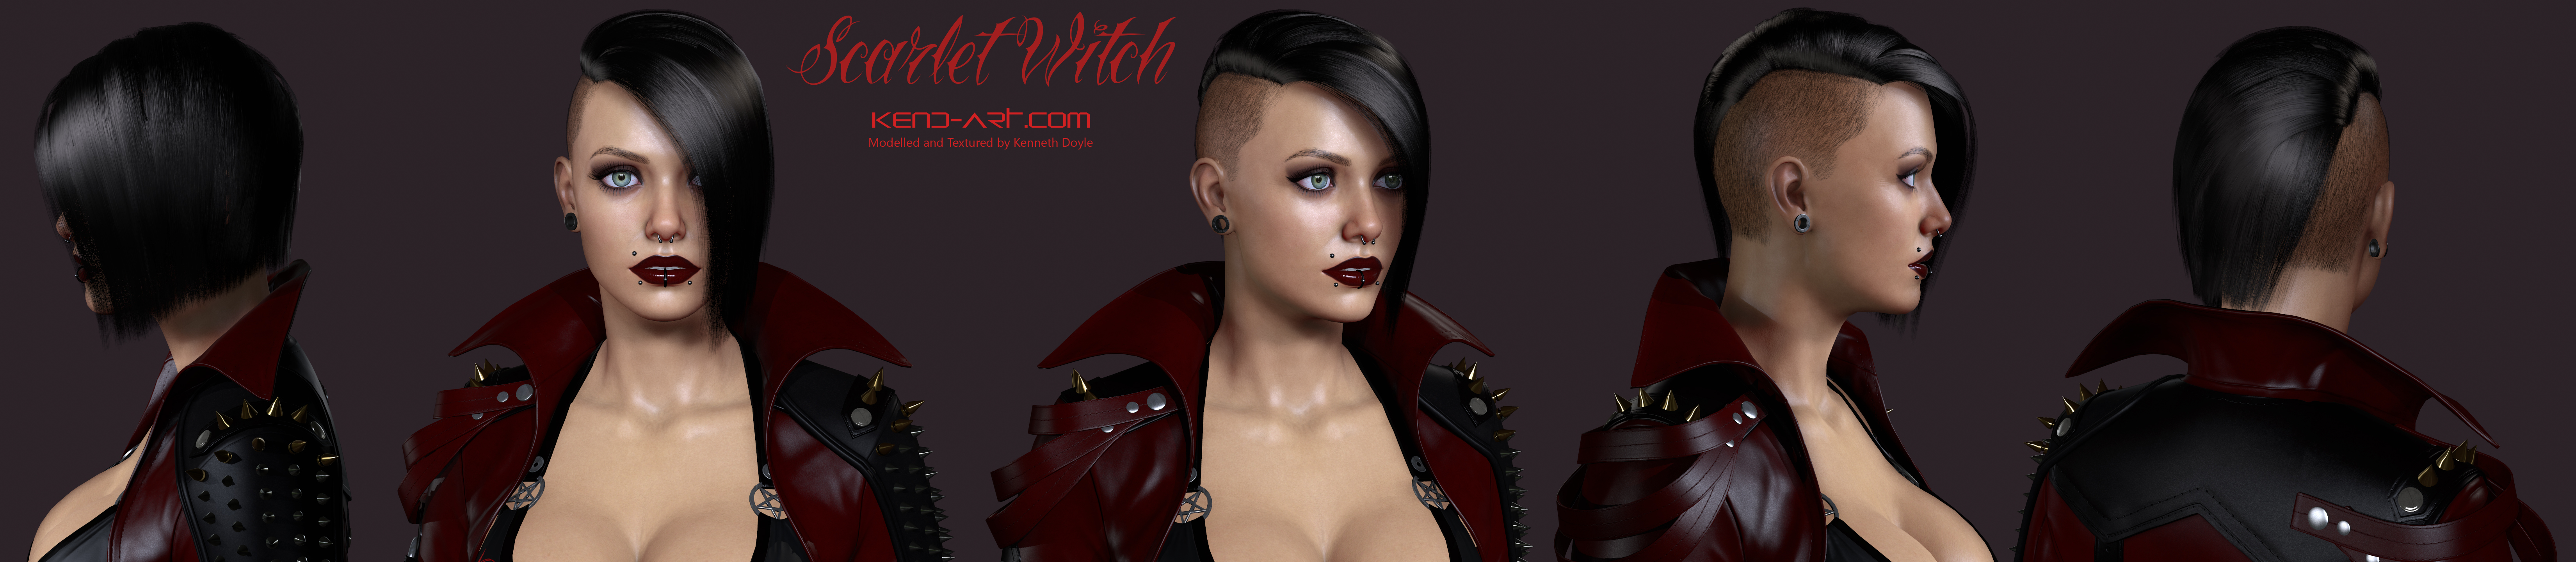 scarlet_witch_head_shots_by_kdoyle9-d953bac.jpg